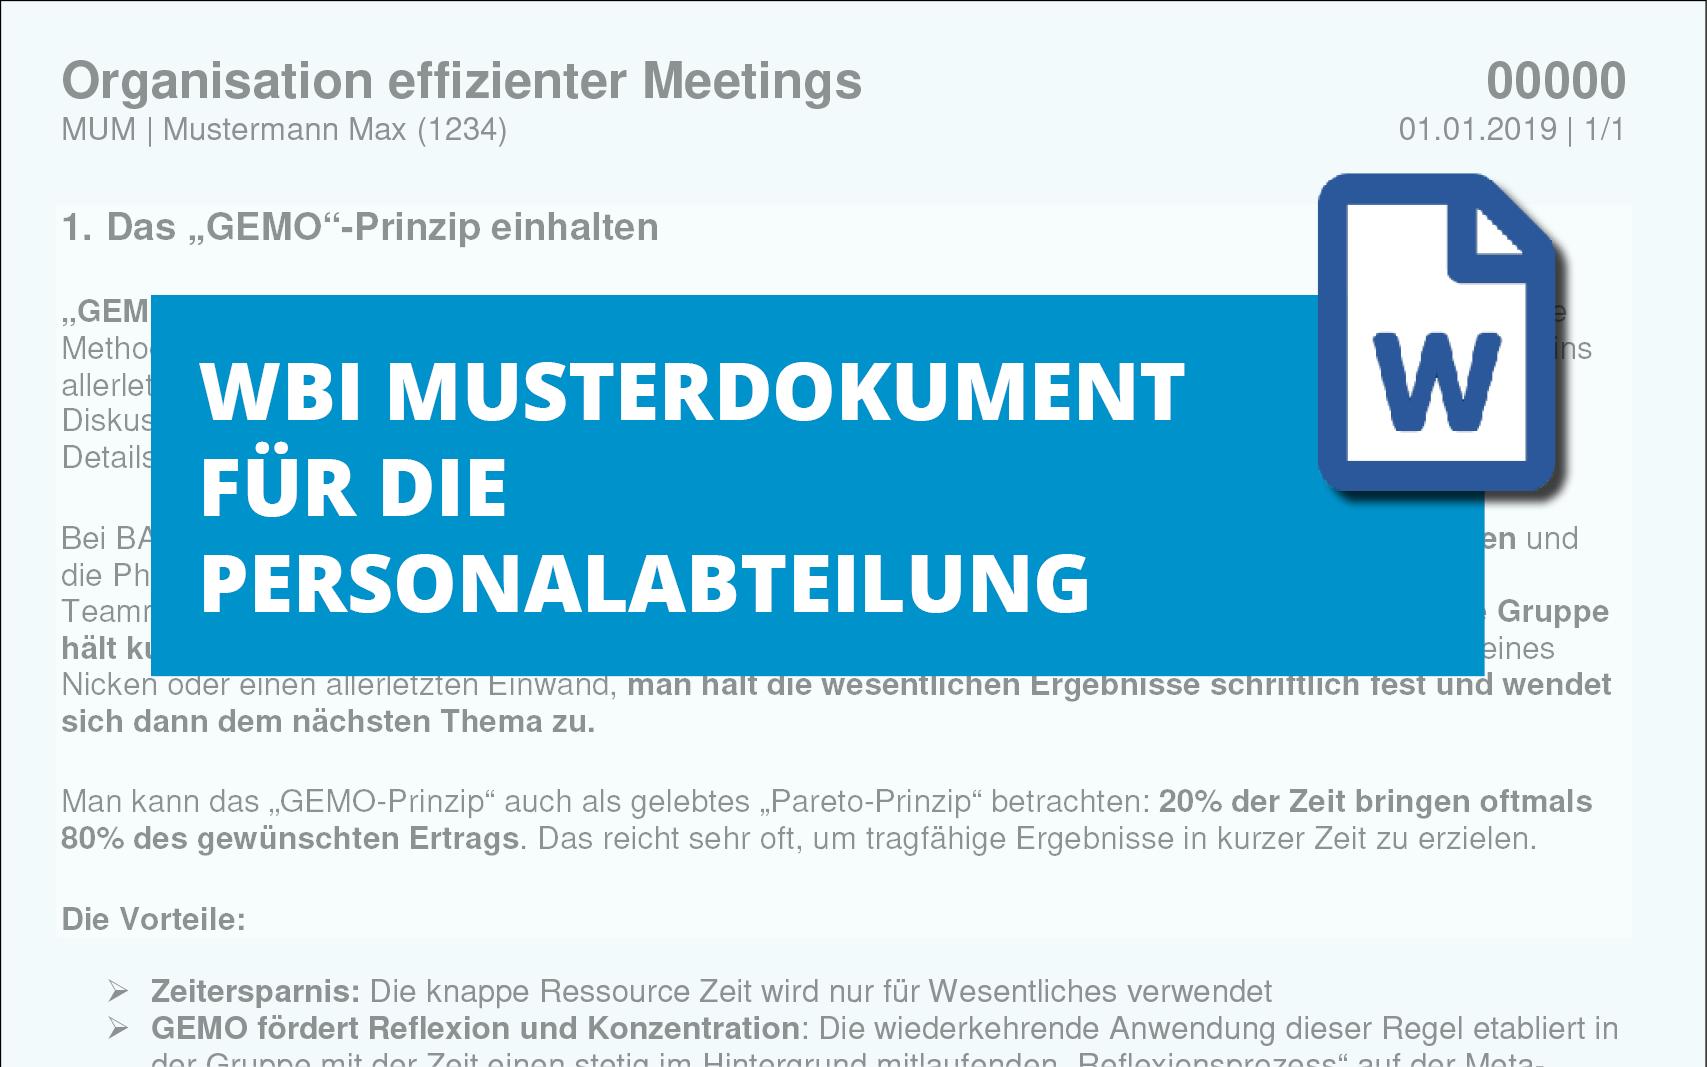 organisation-effizienter-meetings